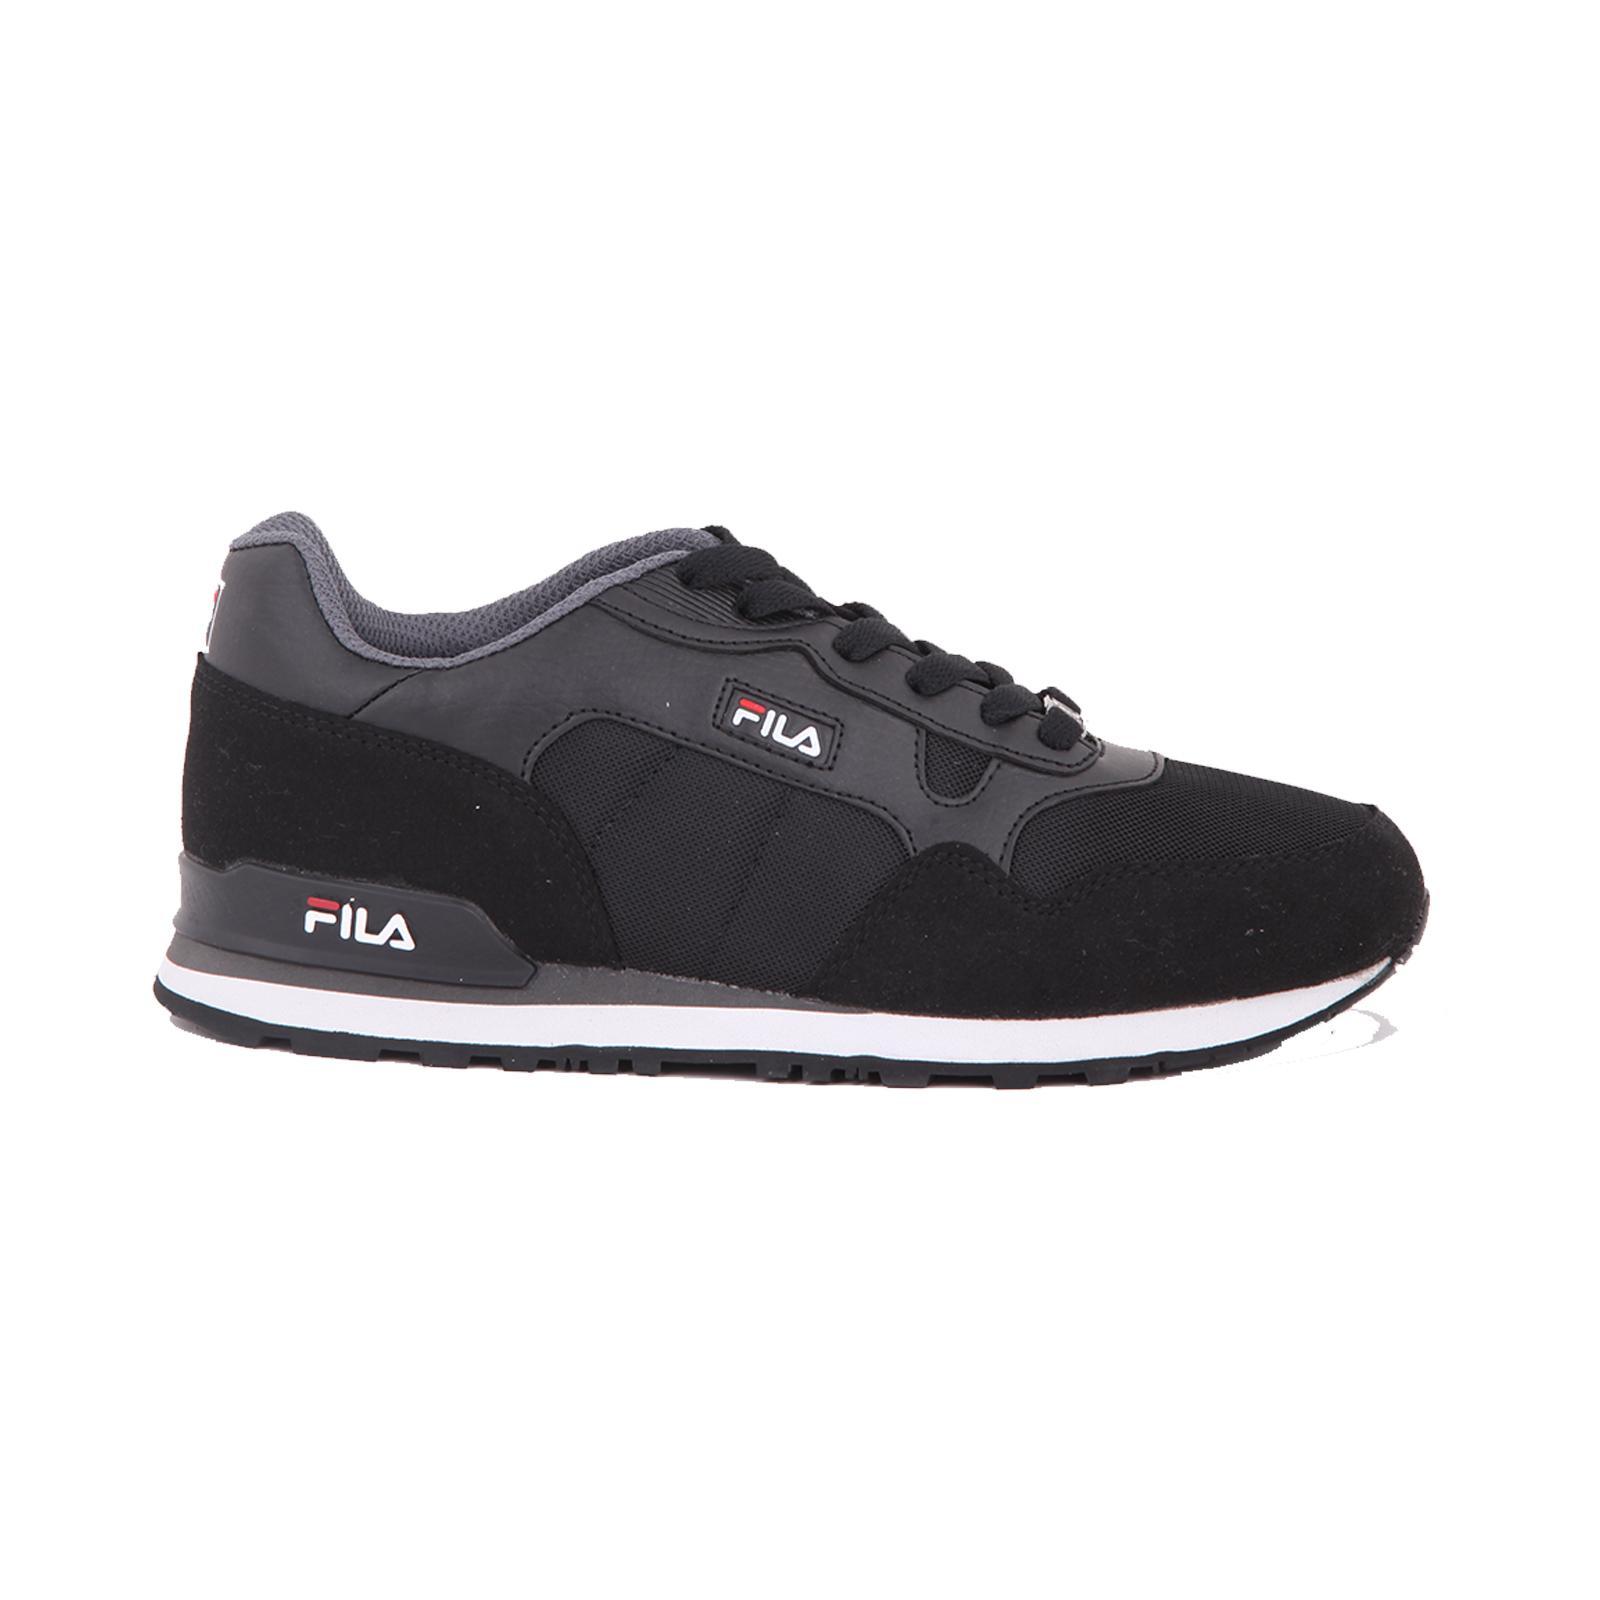 Fila Sepatu Lifestyle Cress